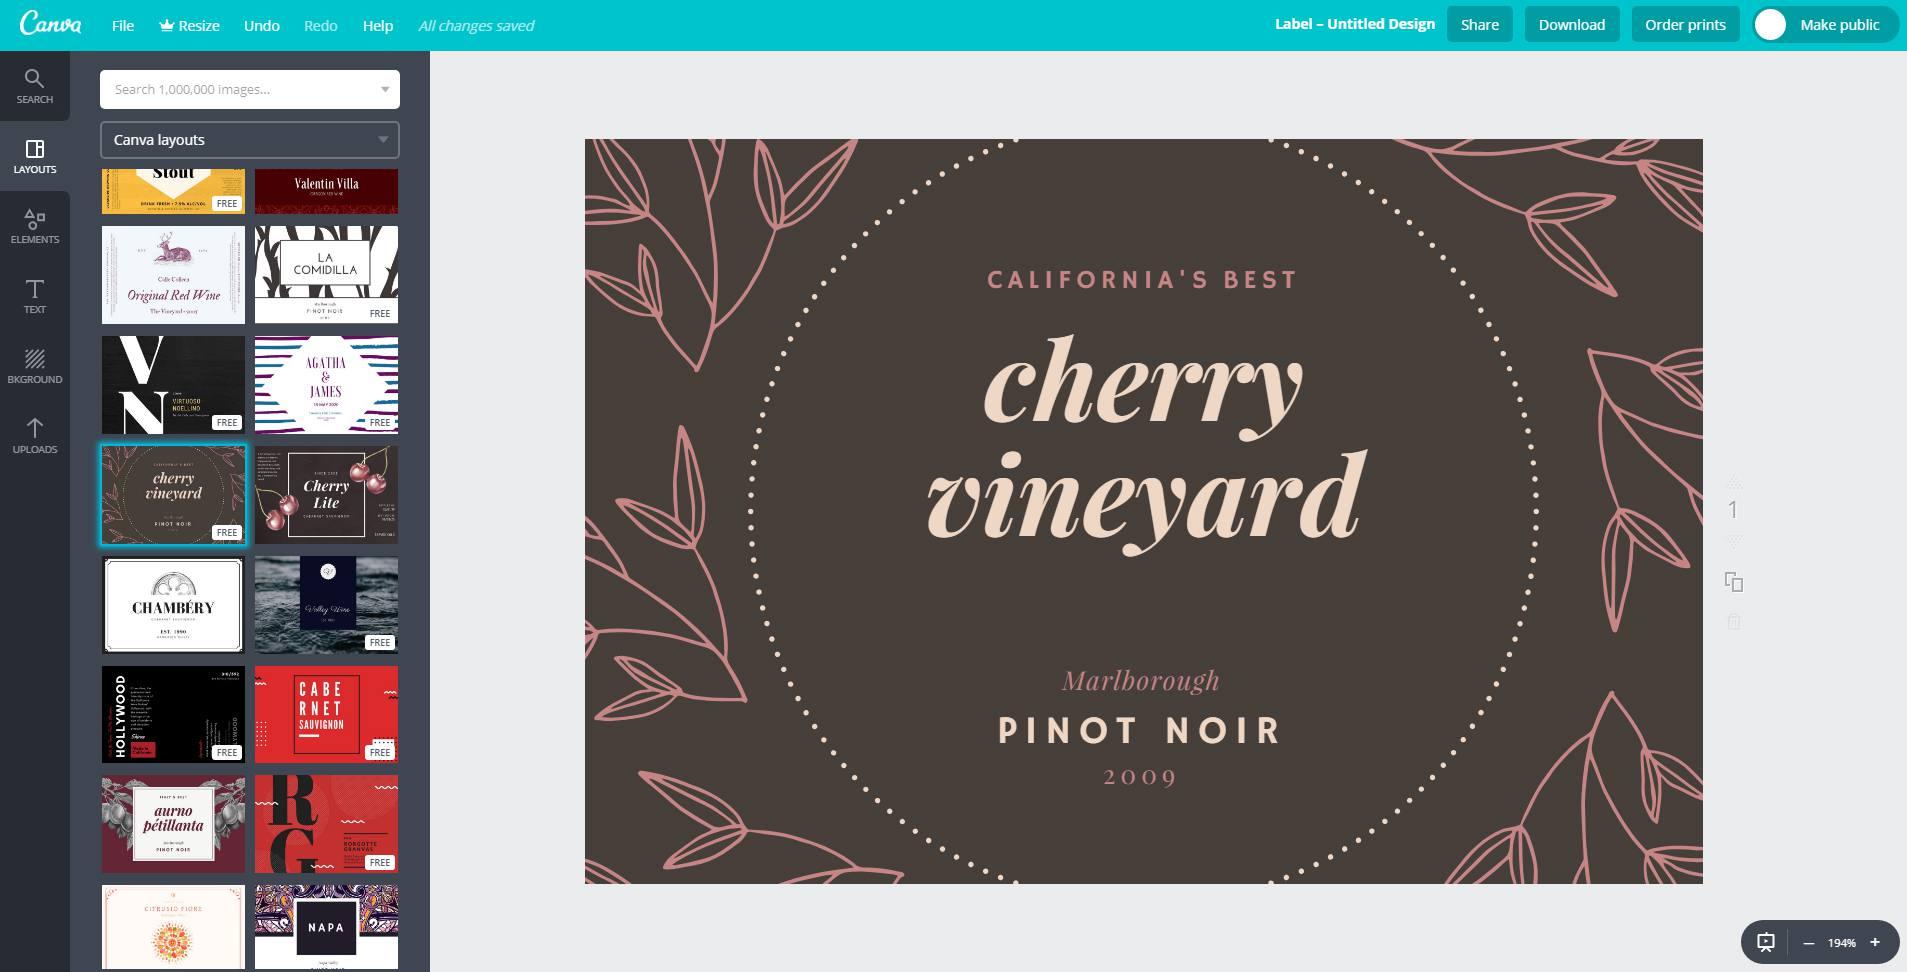 Customizing a wine label in Canva